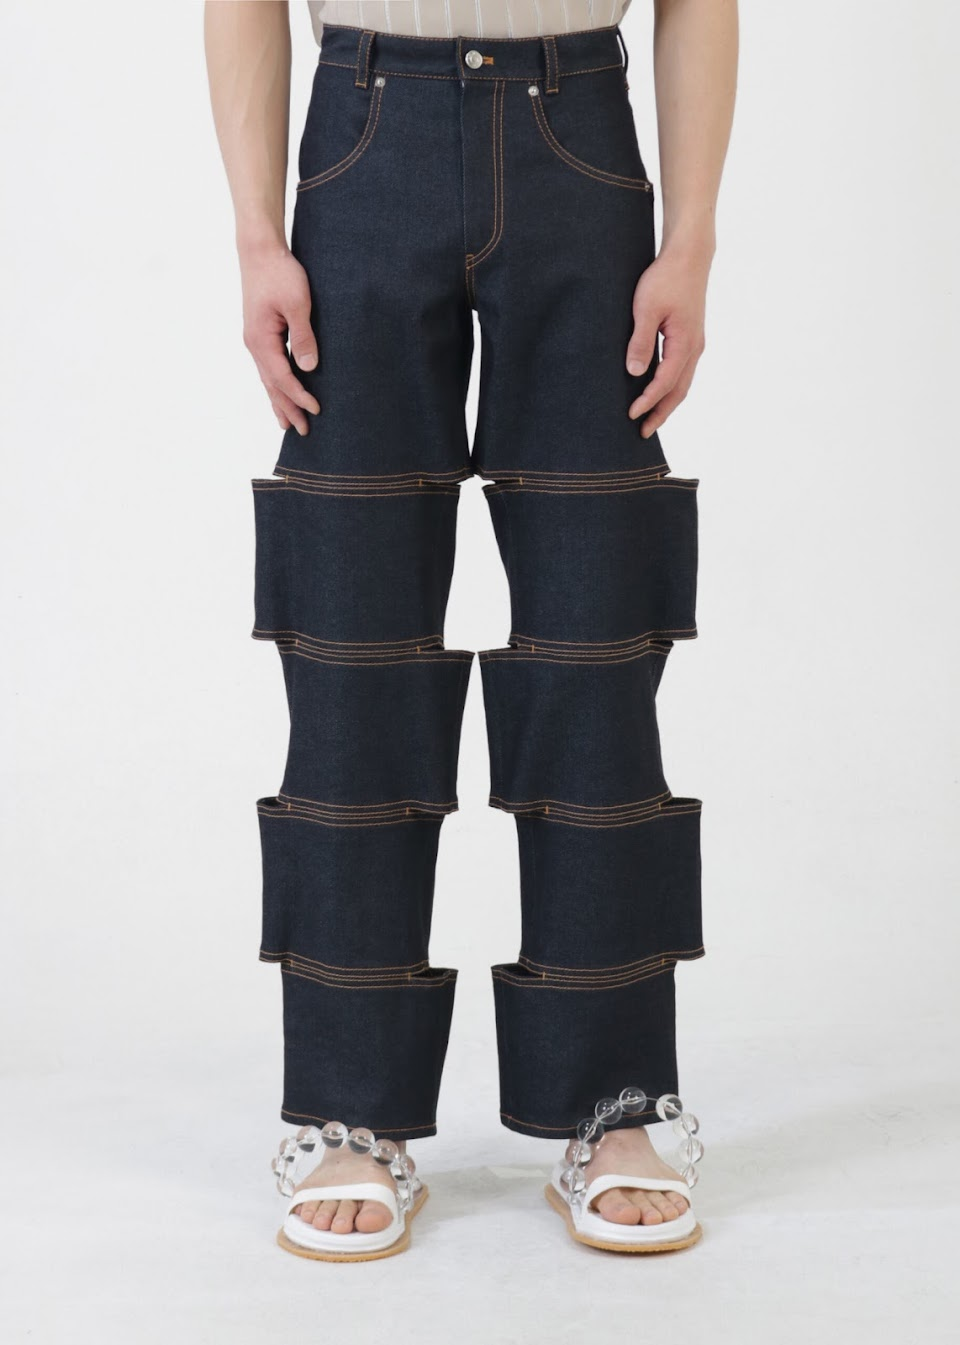 l-pants-dark-1-scaled